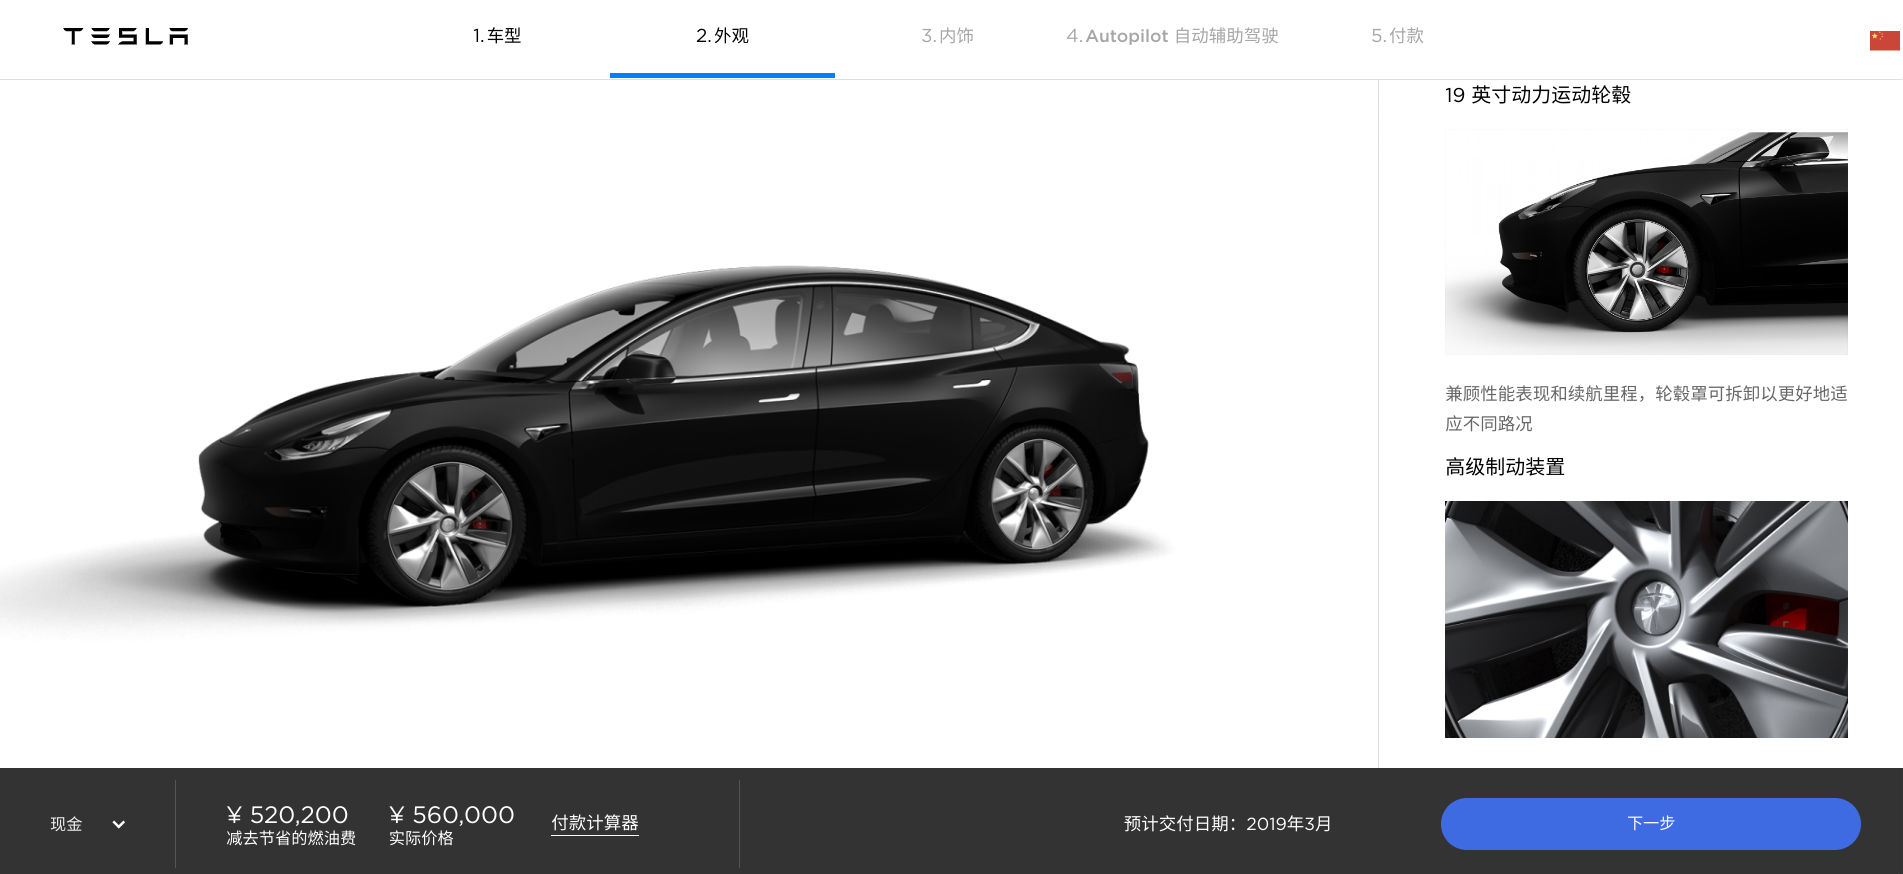 model-3-configurator-china-exterior